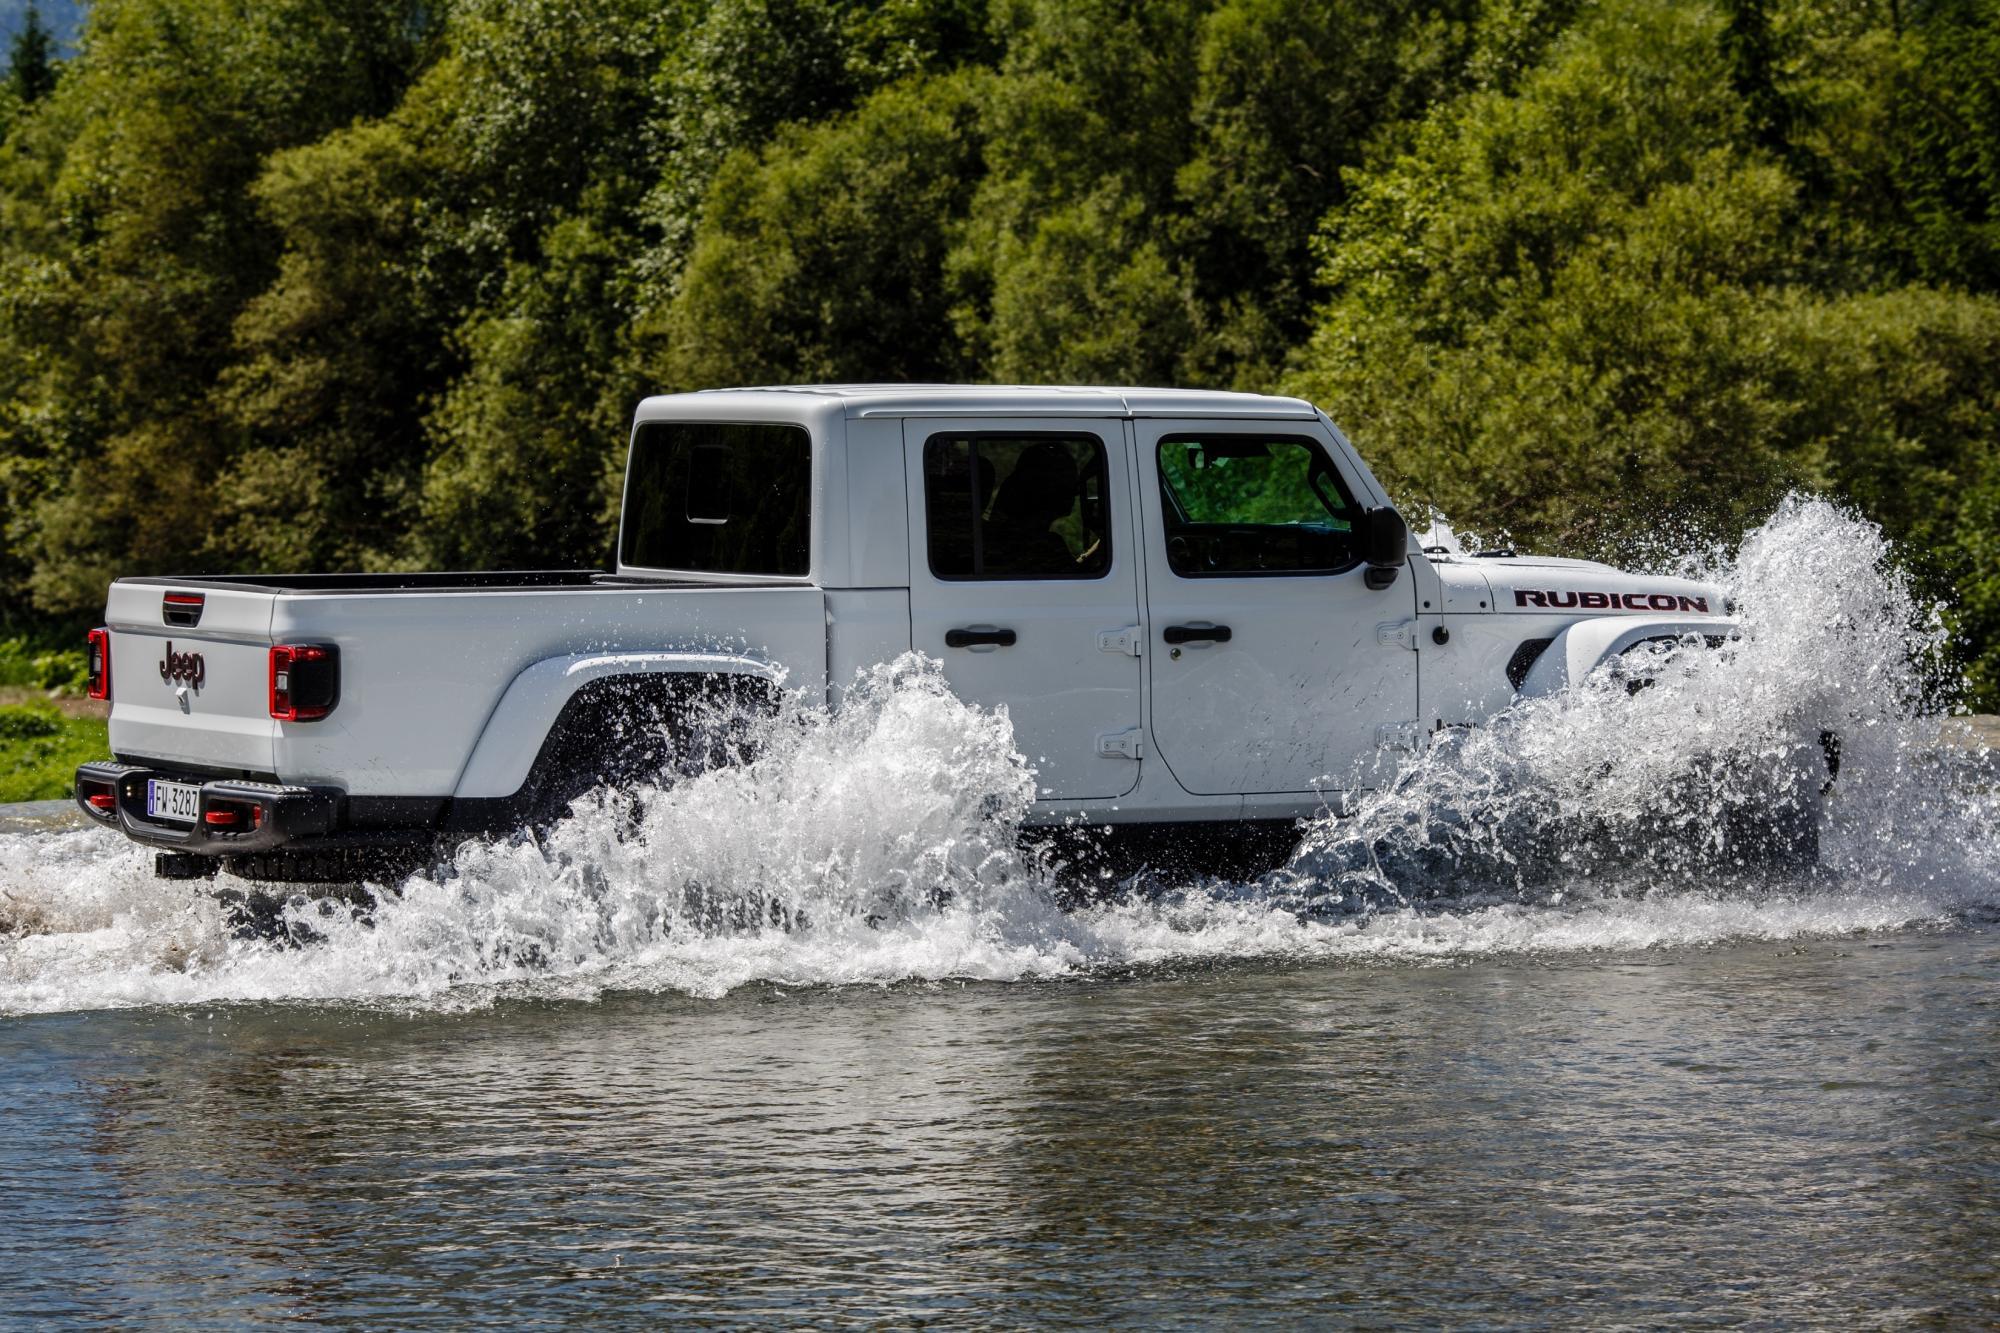 To Jeep Gladiator κατακτά τον τίτλο του πιο ικανού 4x4 Pickup